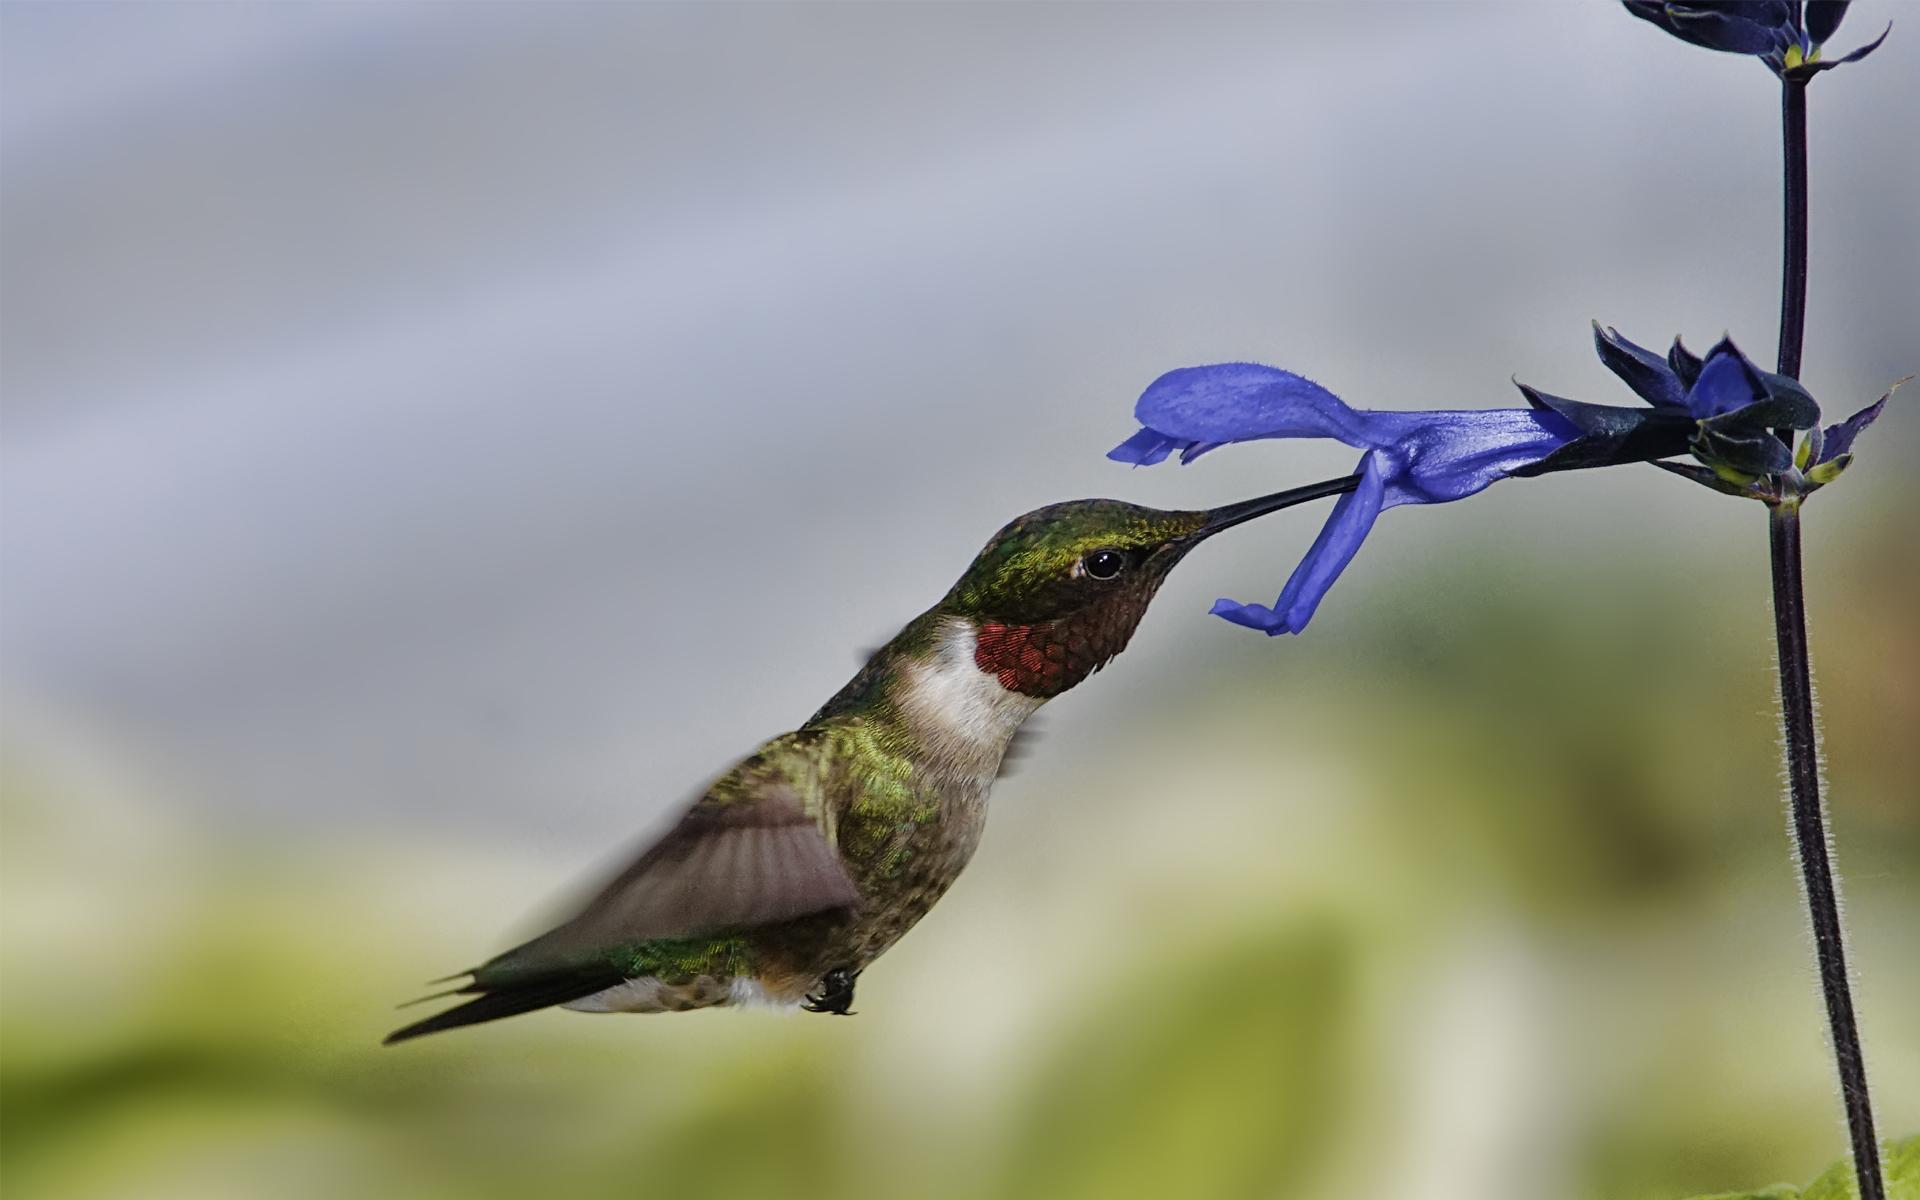 животное птица колибри макро бесплатно